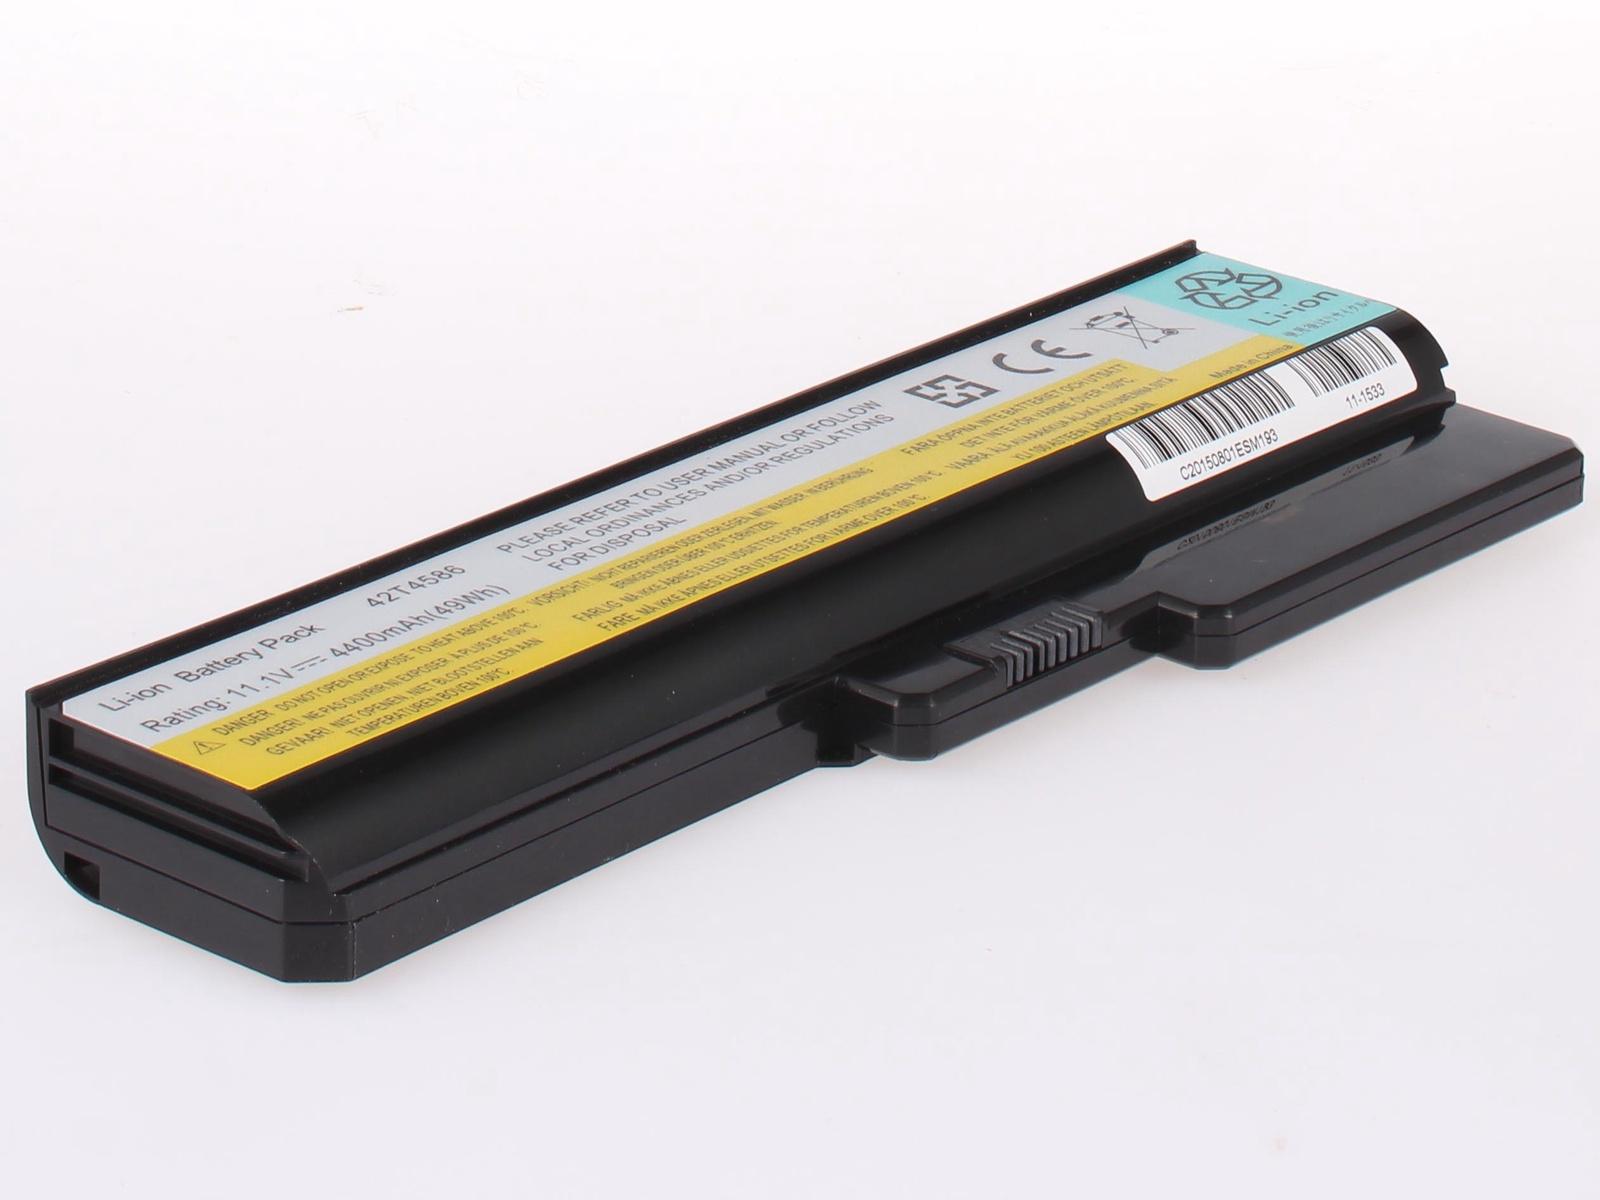 Фото - Аккумулятор для ноутбука AnyBatt iBM-Lenovo L08S6Y02, L08L6Y02, L08N6Y02, L08O4C02, L06L6Y02, L08O6C02, L08S6C02, 42T4726, 42T4727, 42T4725, 42T4585, 42T4586, 42T4729 аккумулятор